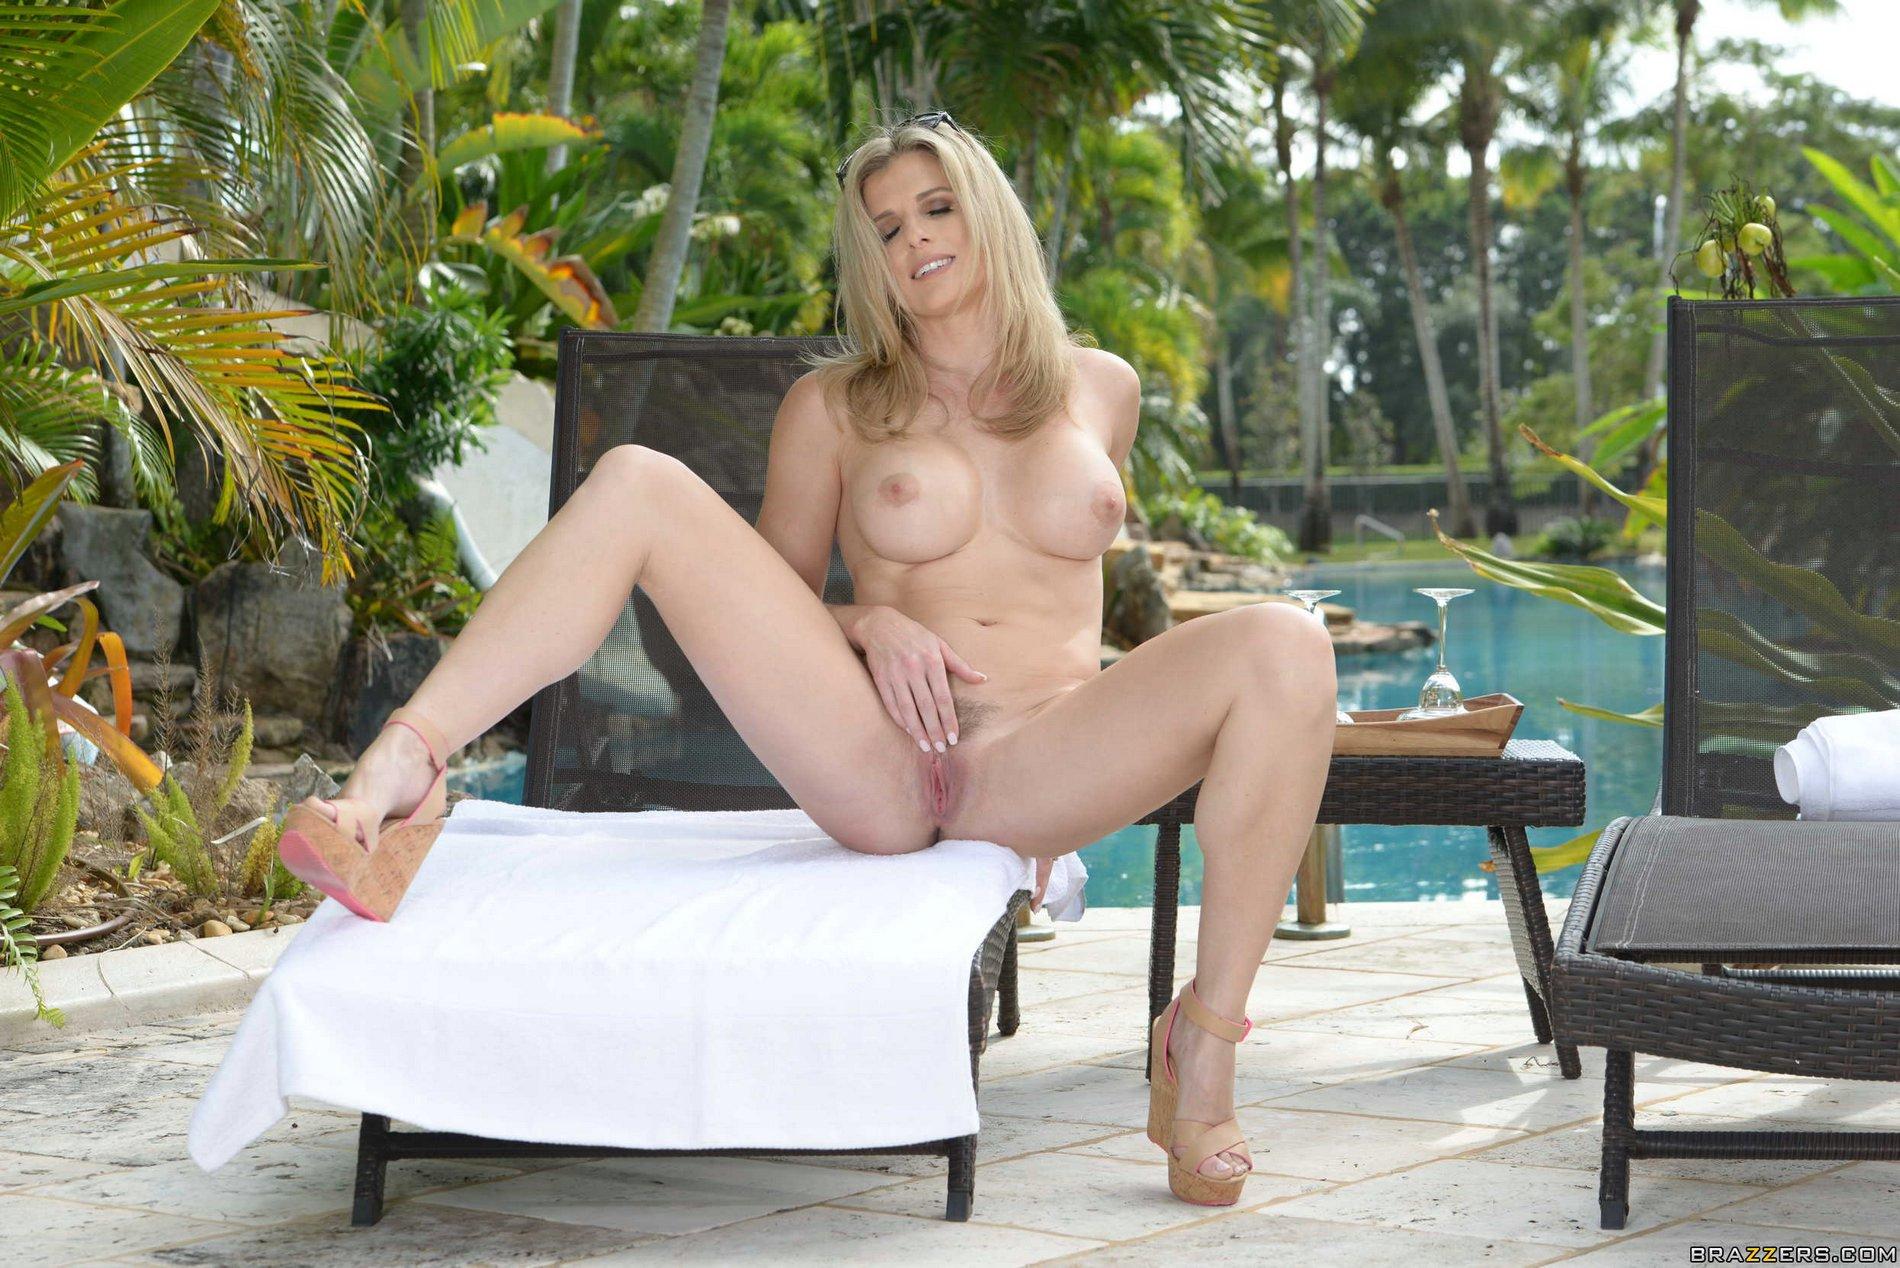 image Blonde hot blowjob at public park